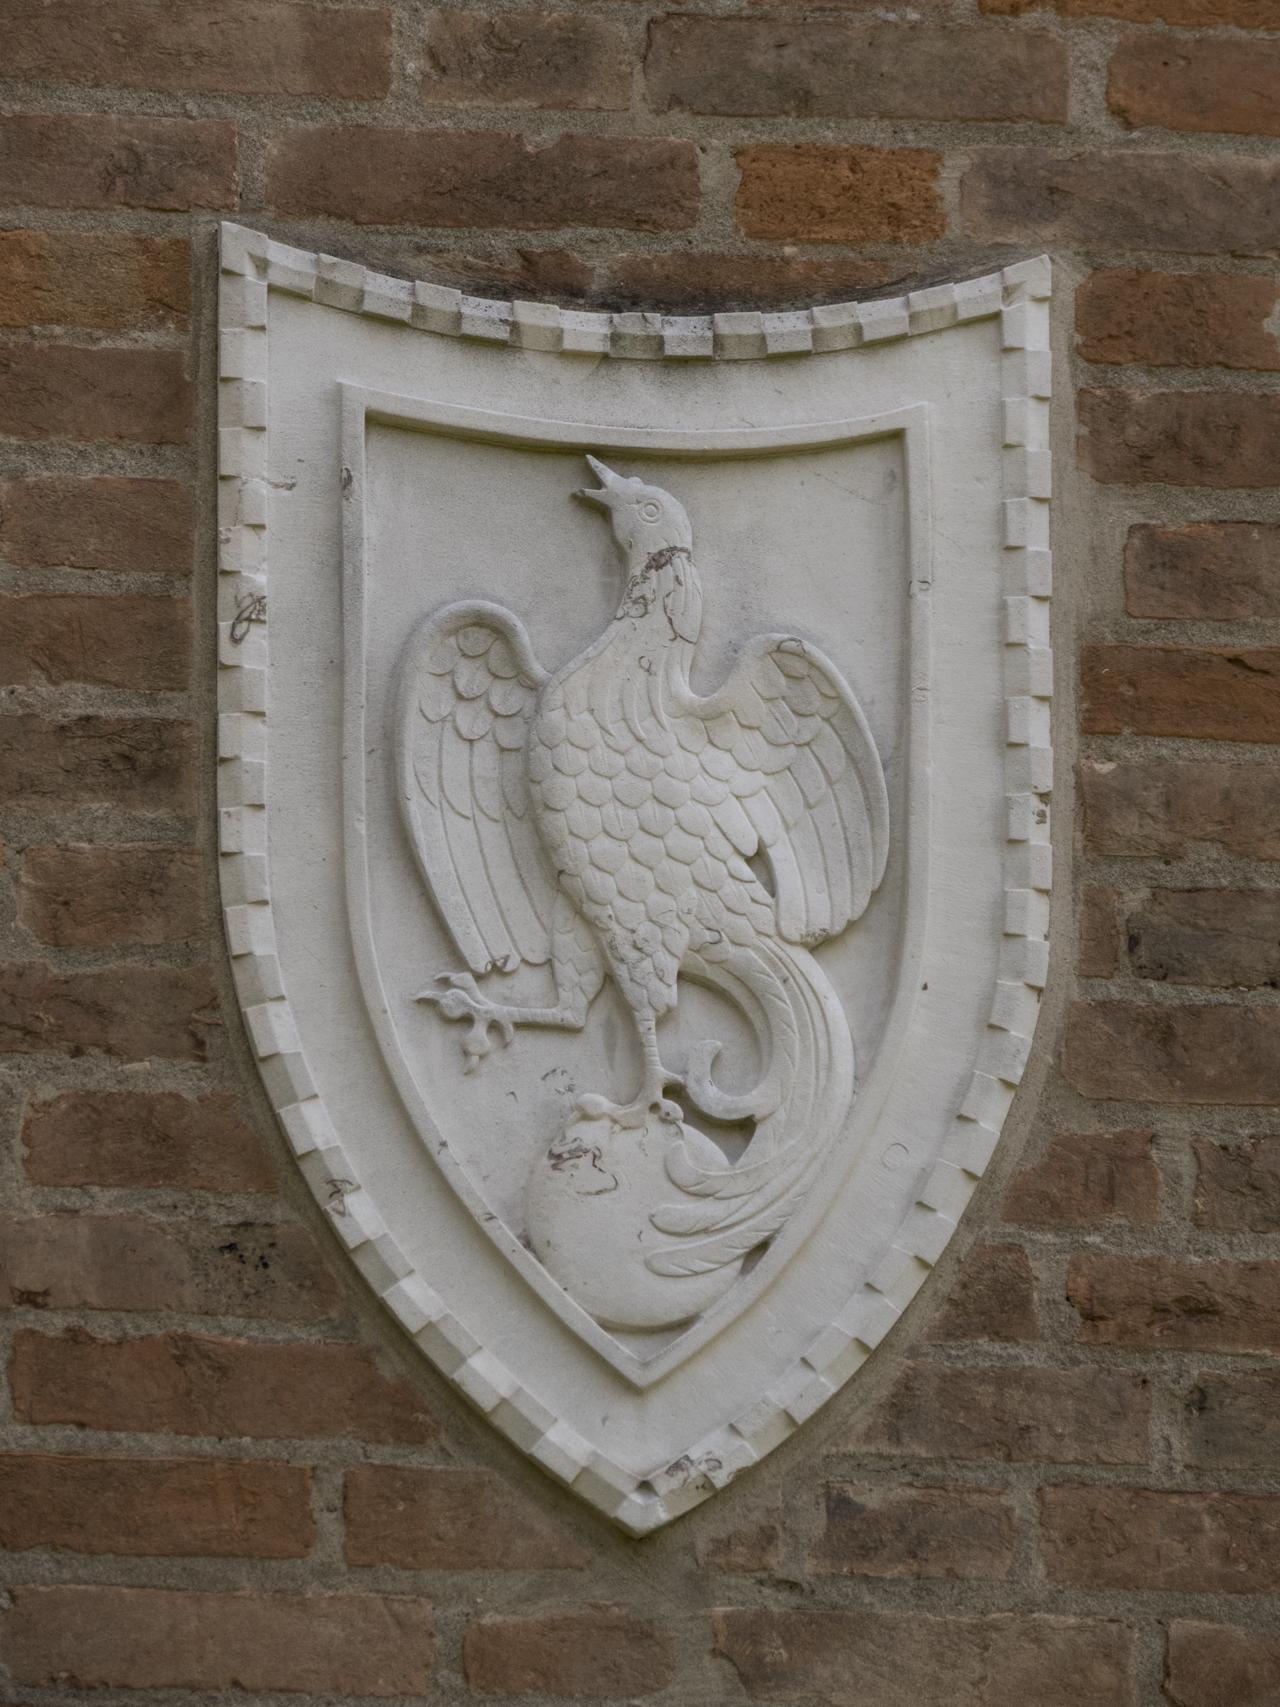 fenice (?) o aquila, globo, motivi decorativi a dentelli (rilievo, serie) - ambito veneziano (sec. XX)